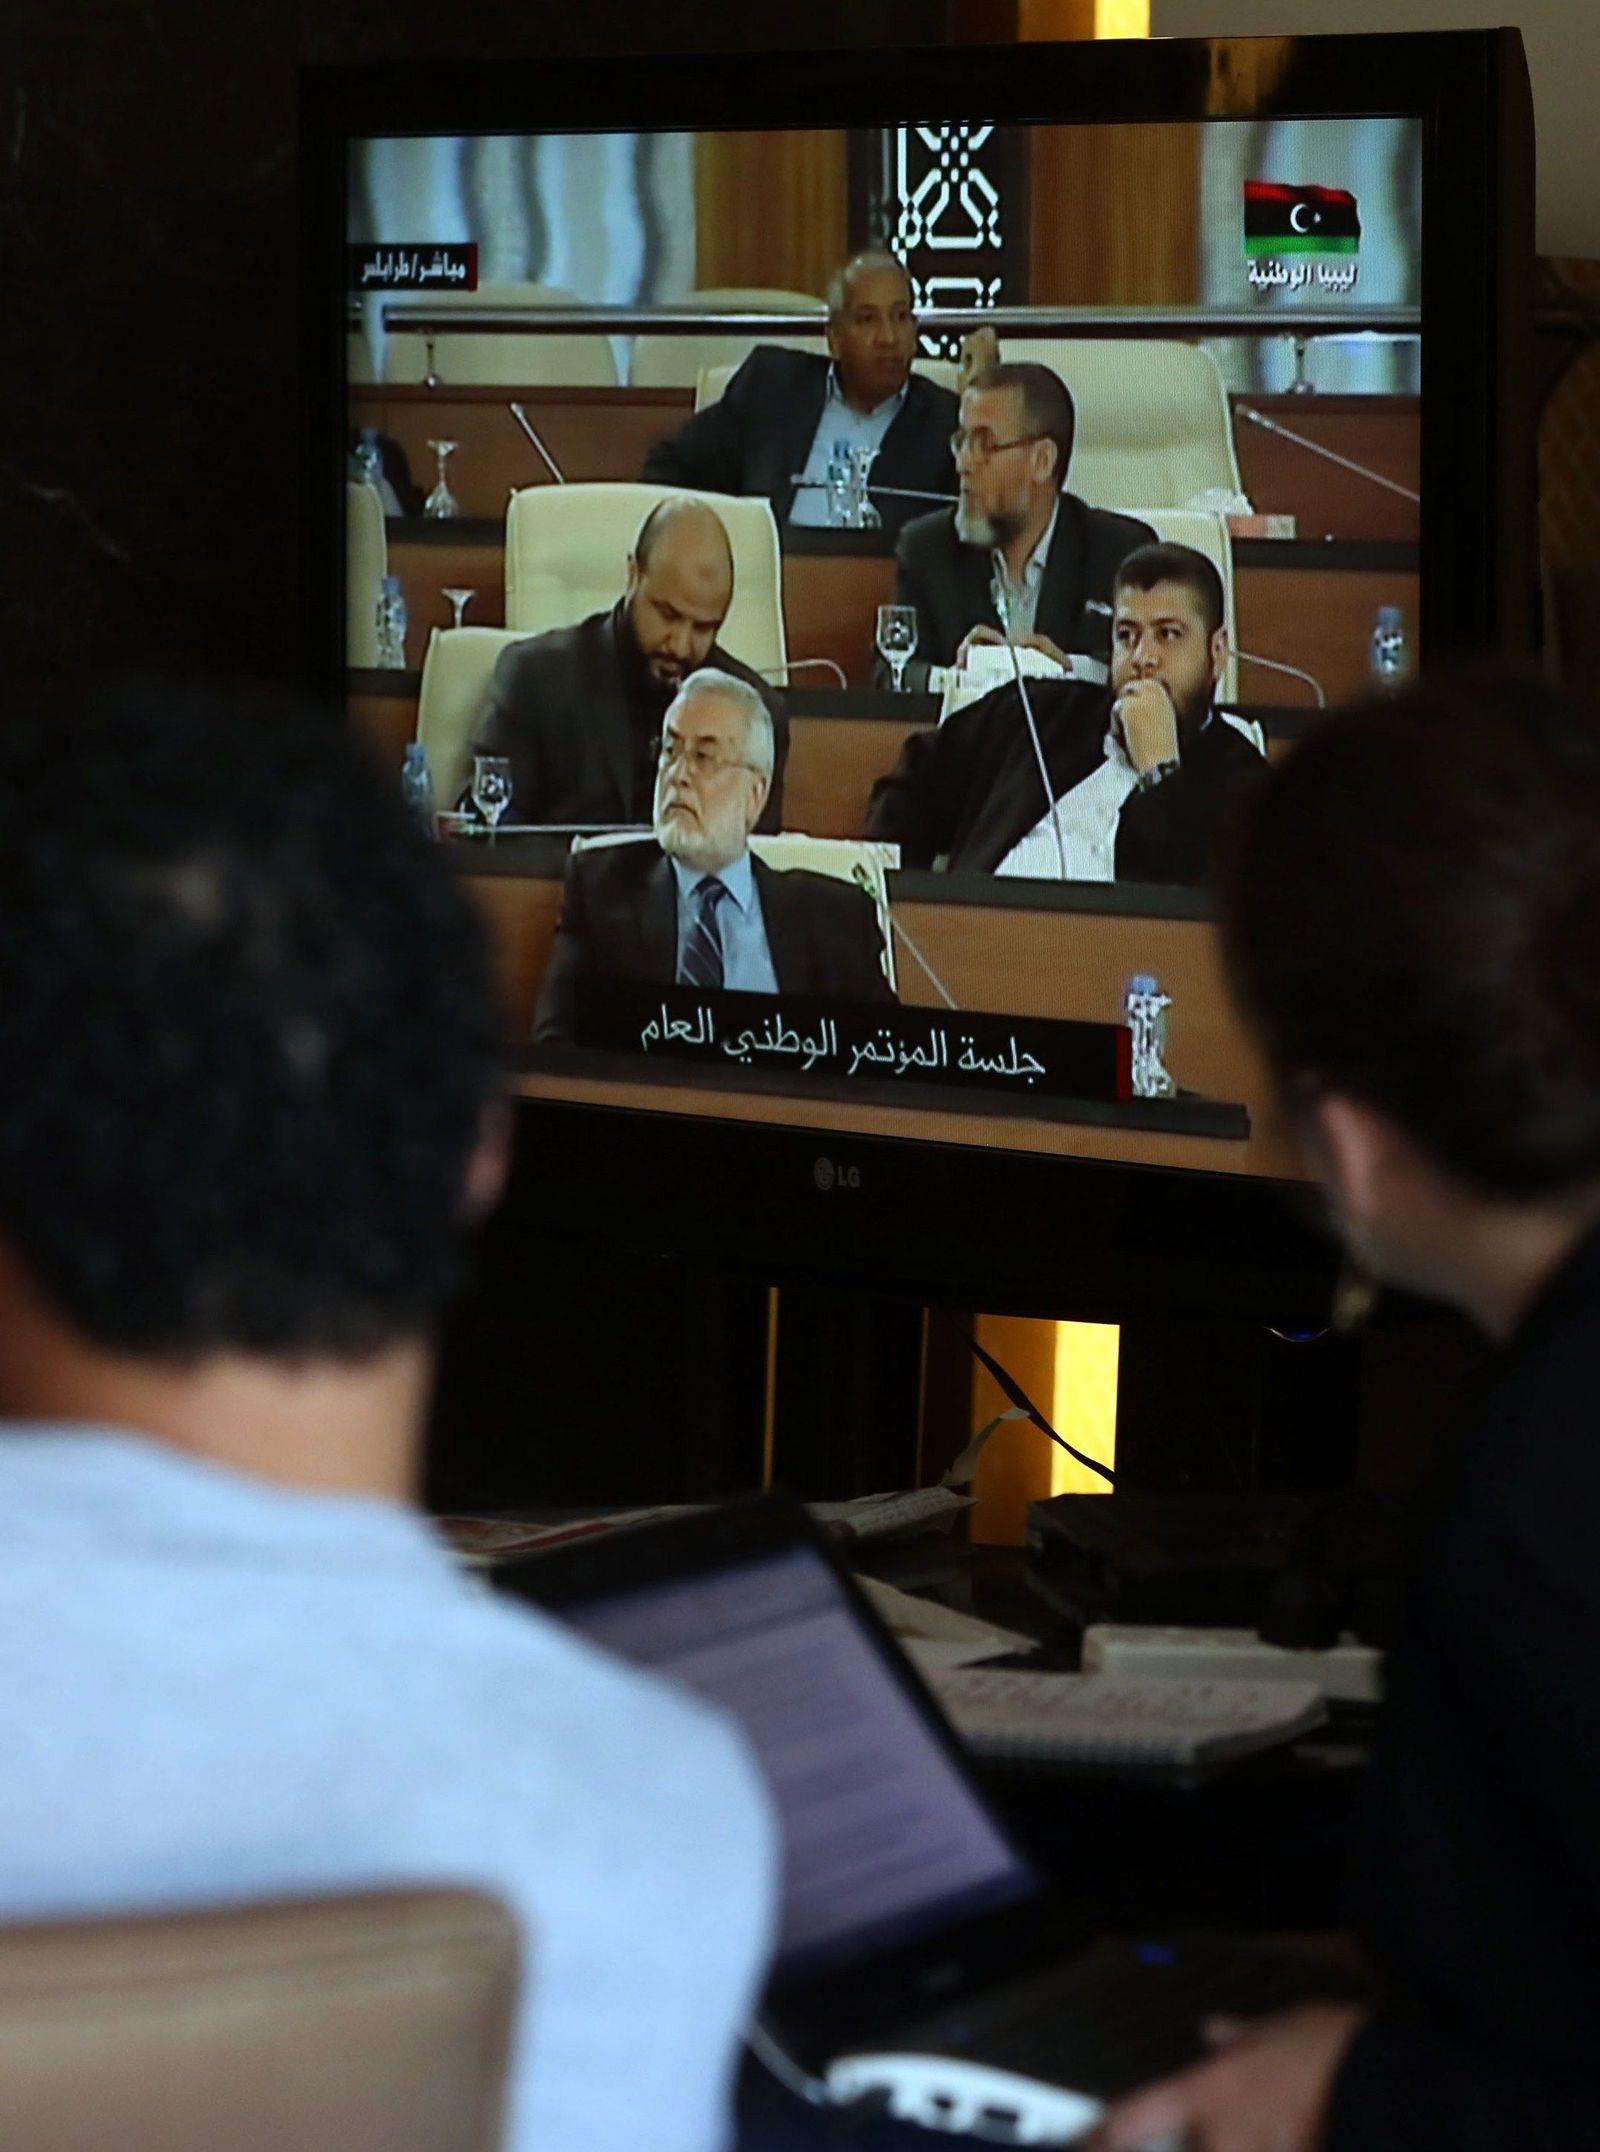 CORRECTION-LIBYA-POLITICS-UNREST